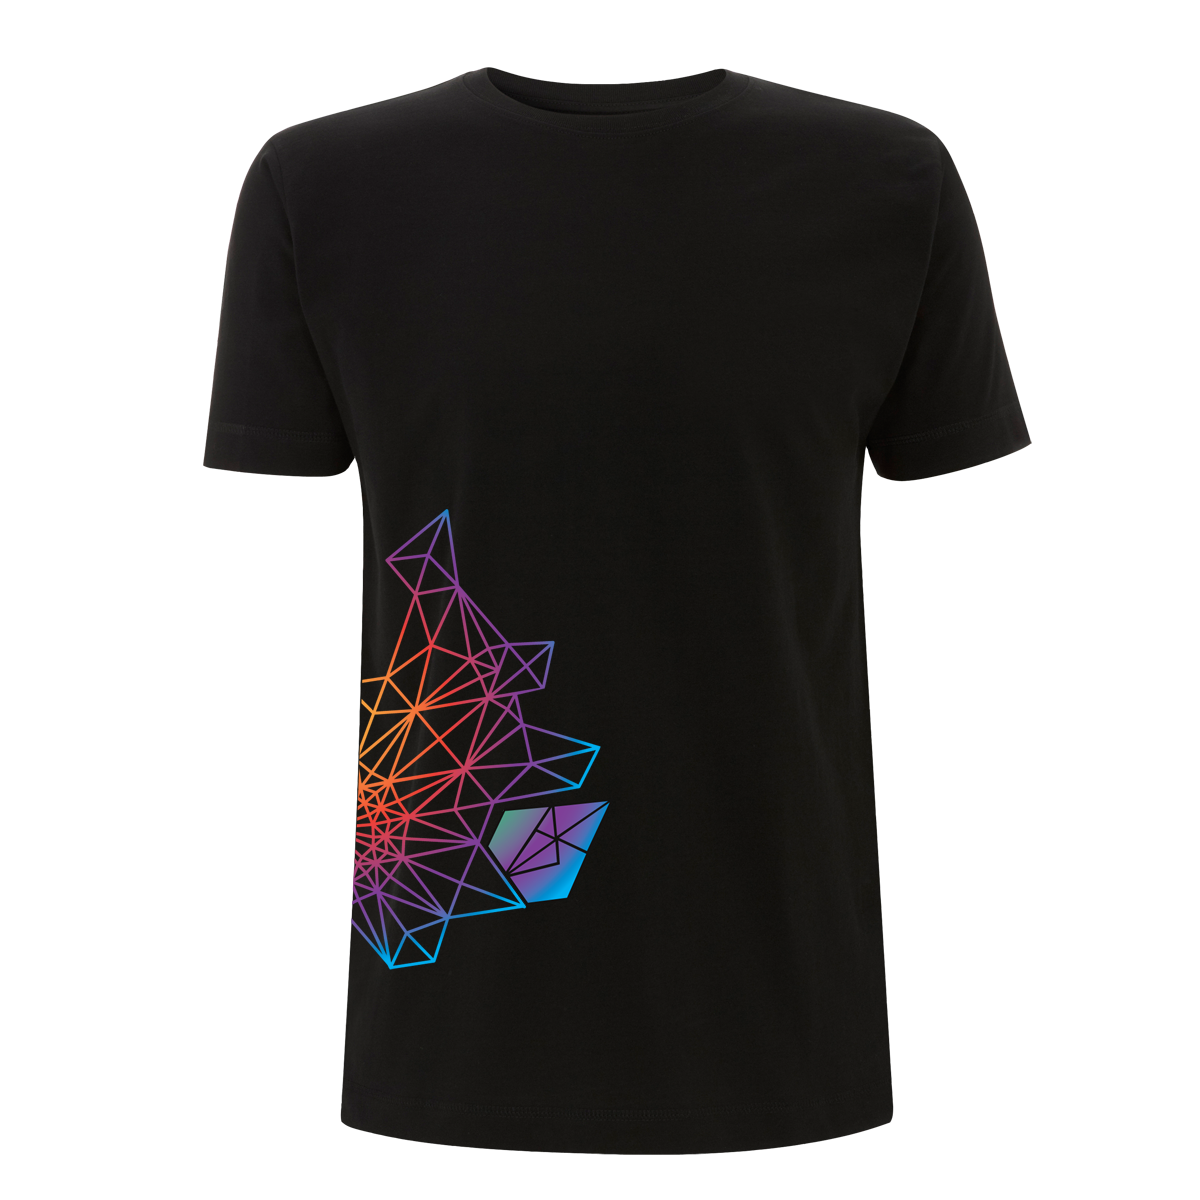 Andreas Bourani Diamant Regenbogen Shirt Herren T-Shirt, schwarz